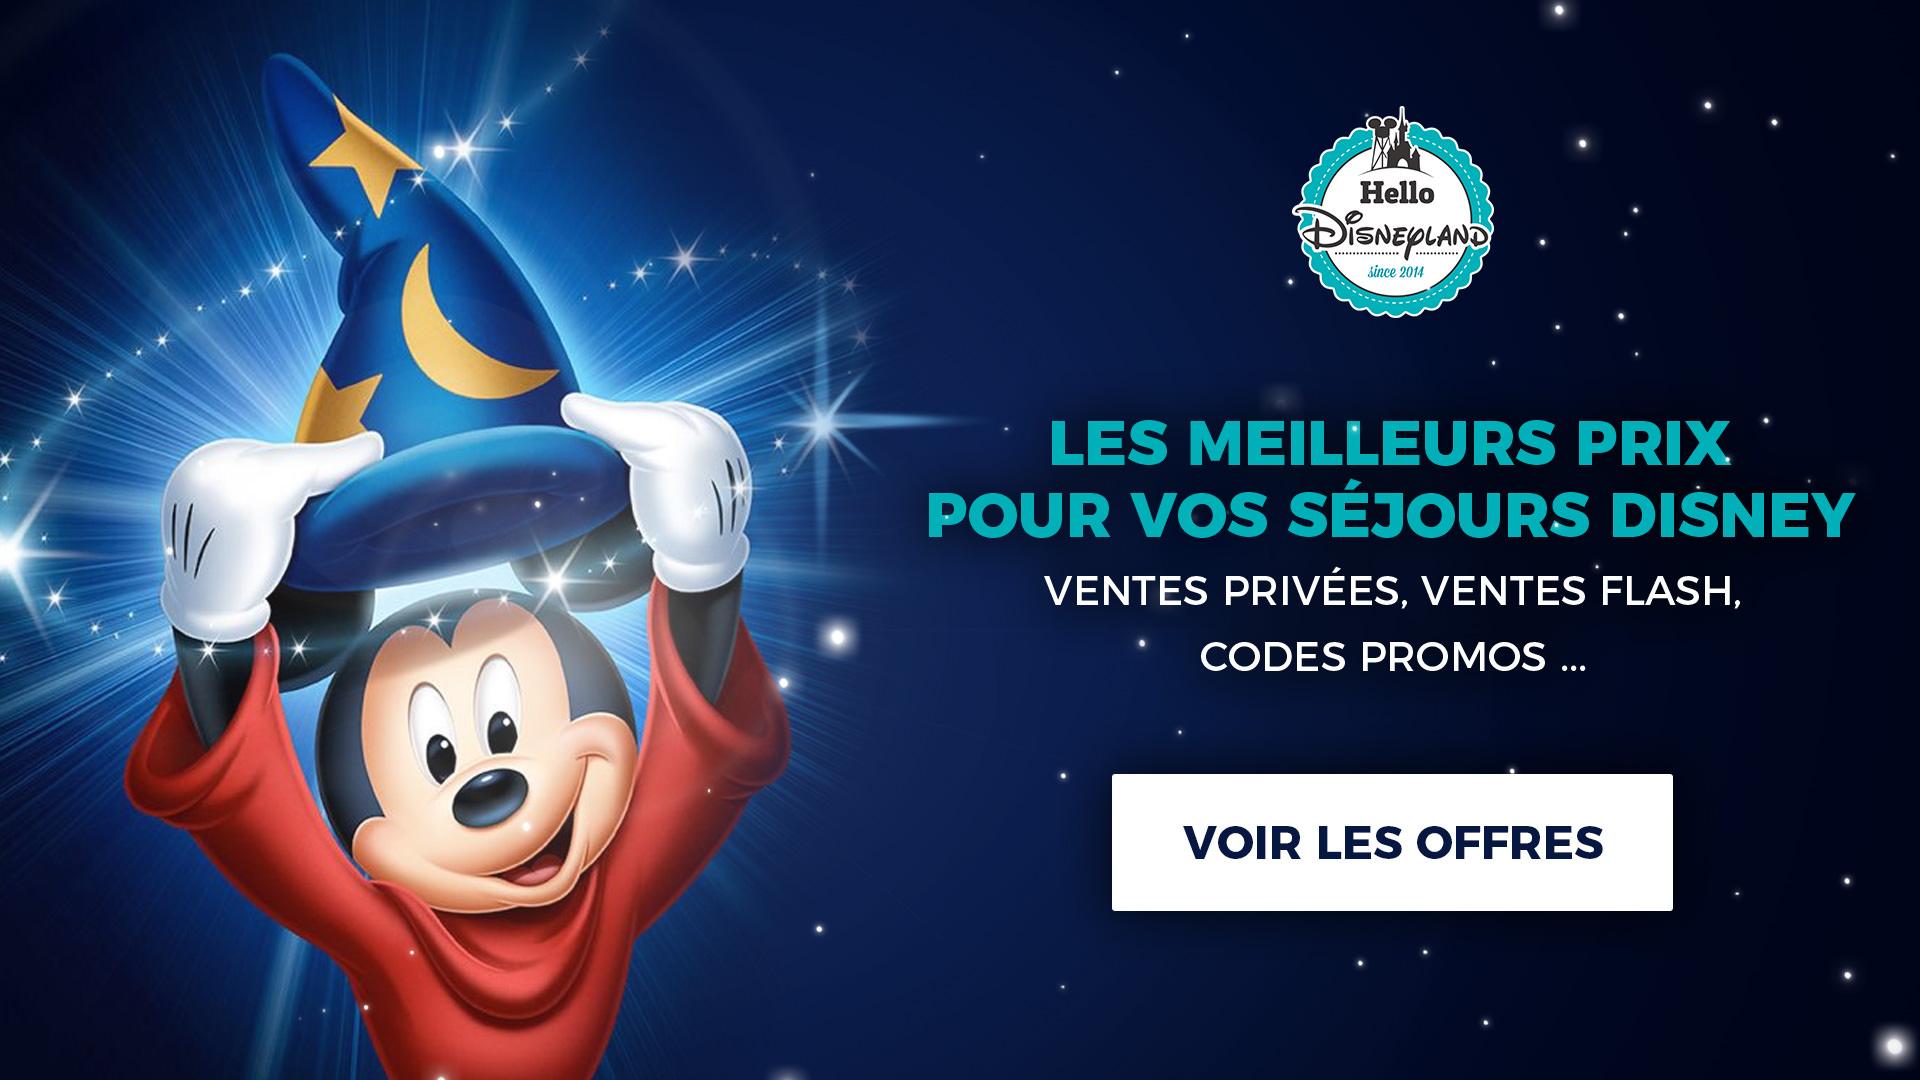 Hello Disneyland   Le blog n°1 sur Disneyland Paris   Disneyland ... 4162d23967c3